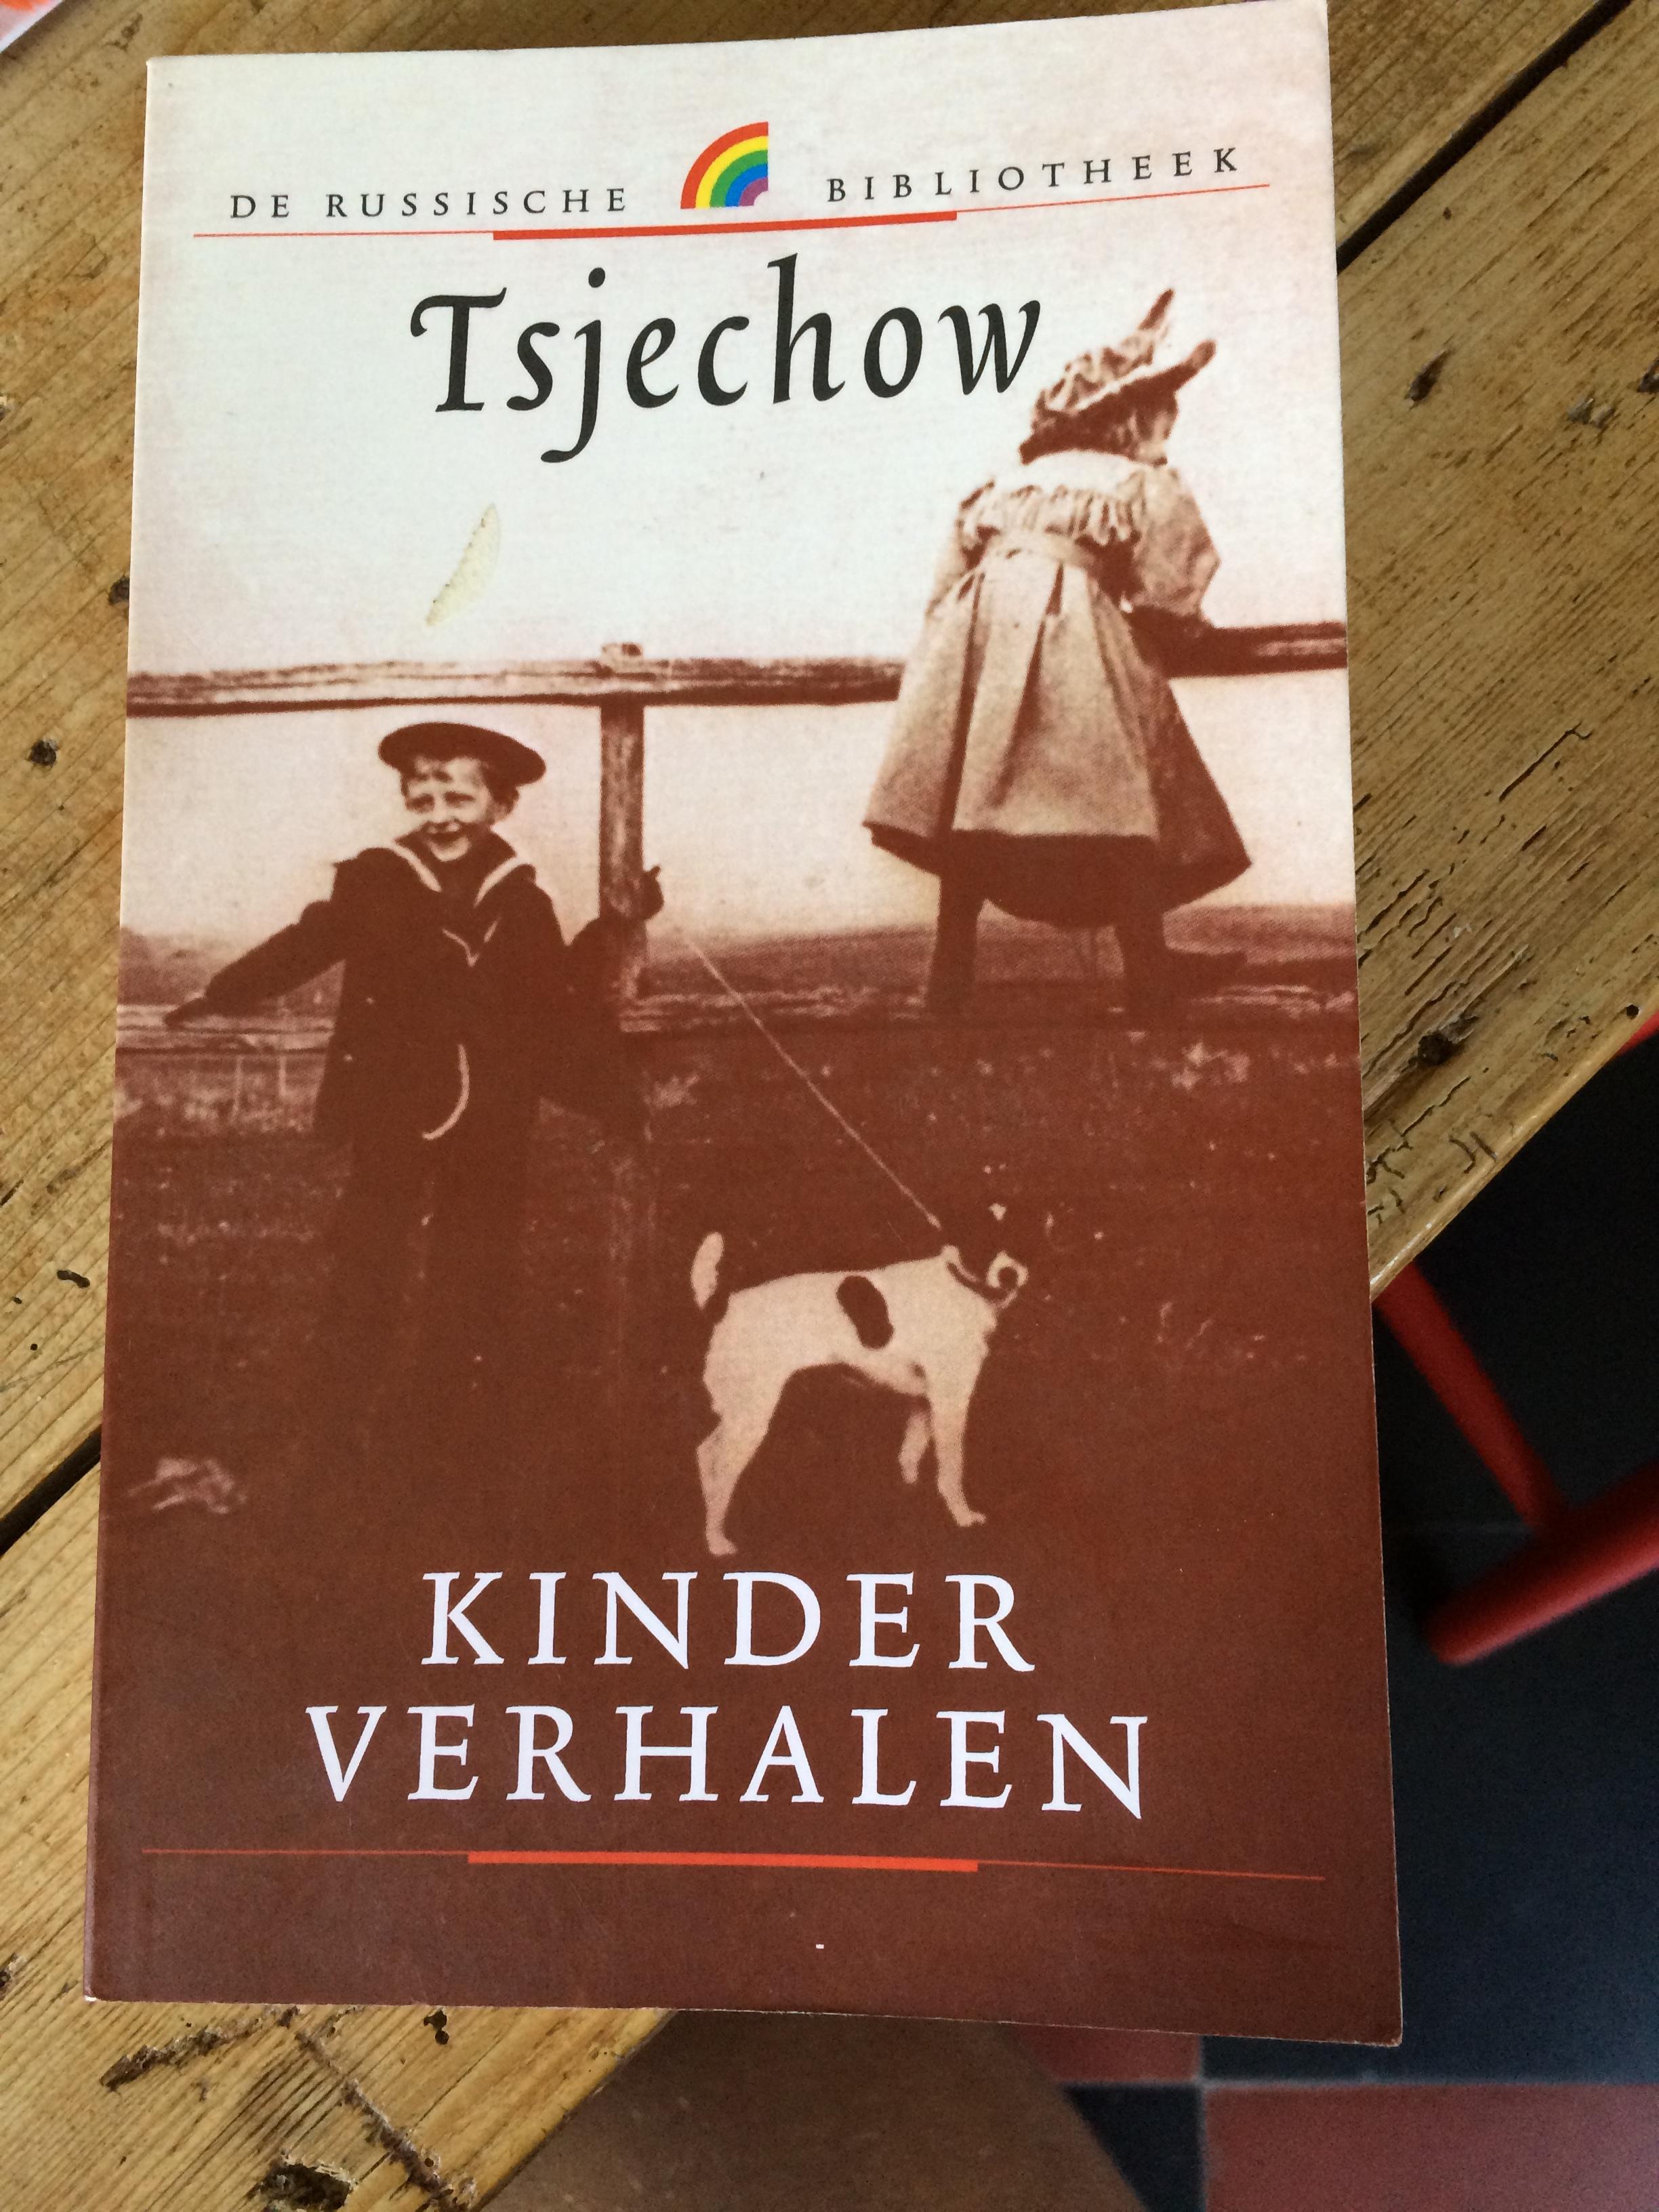 Kinderverhalen - Tsjechow